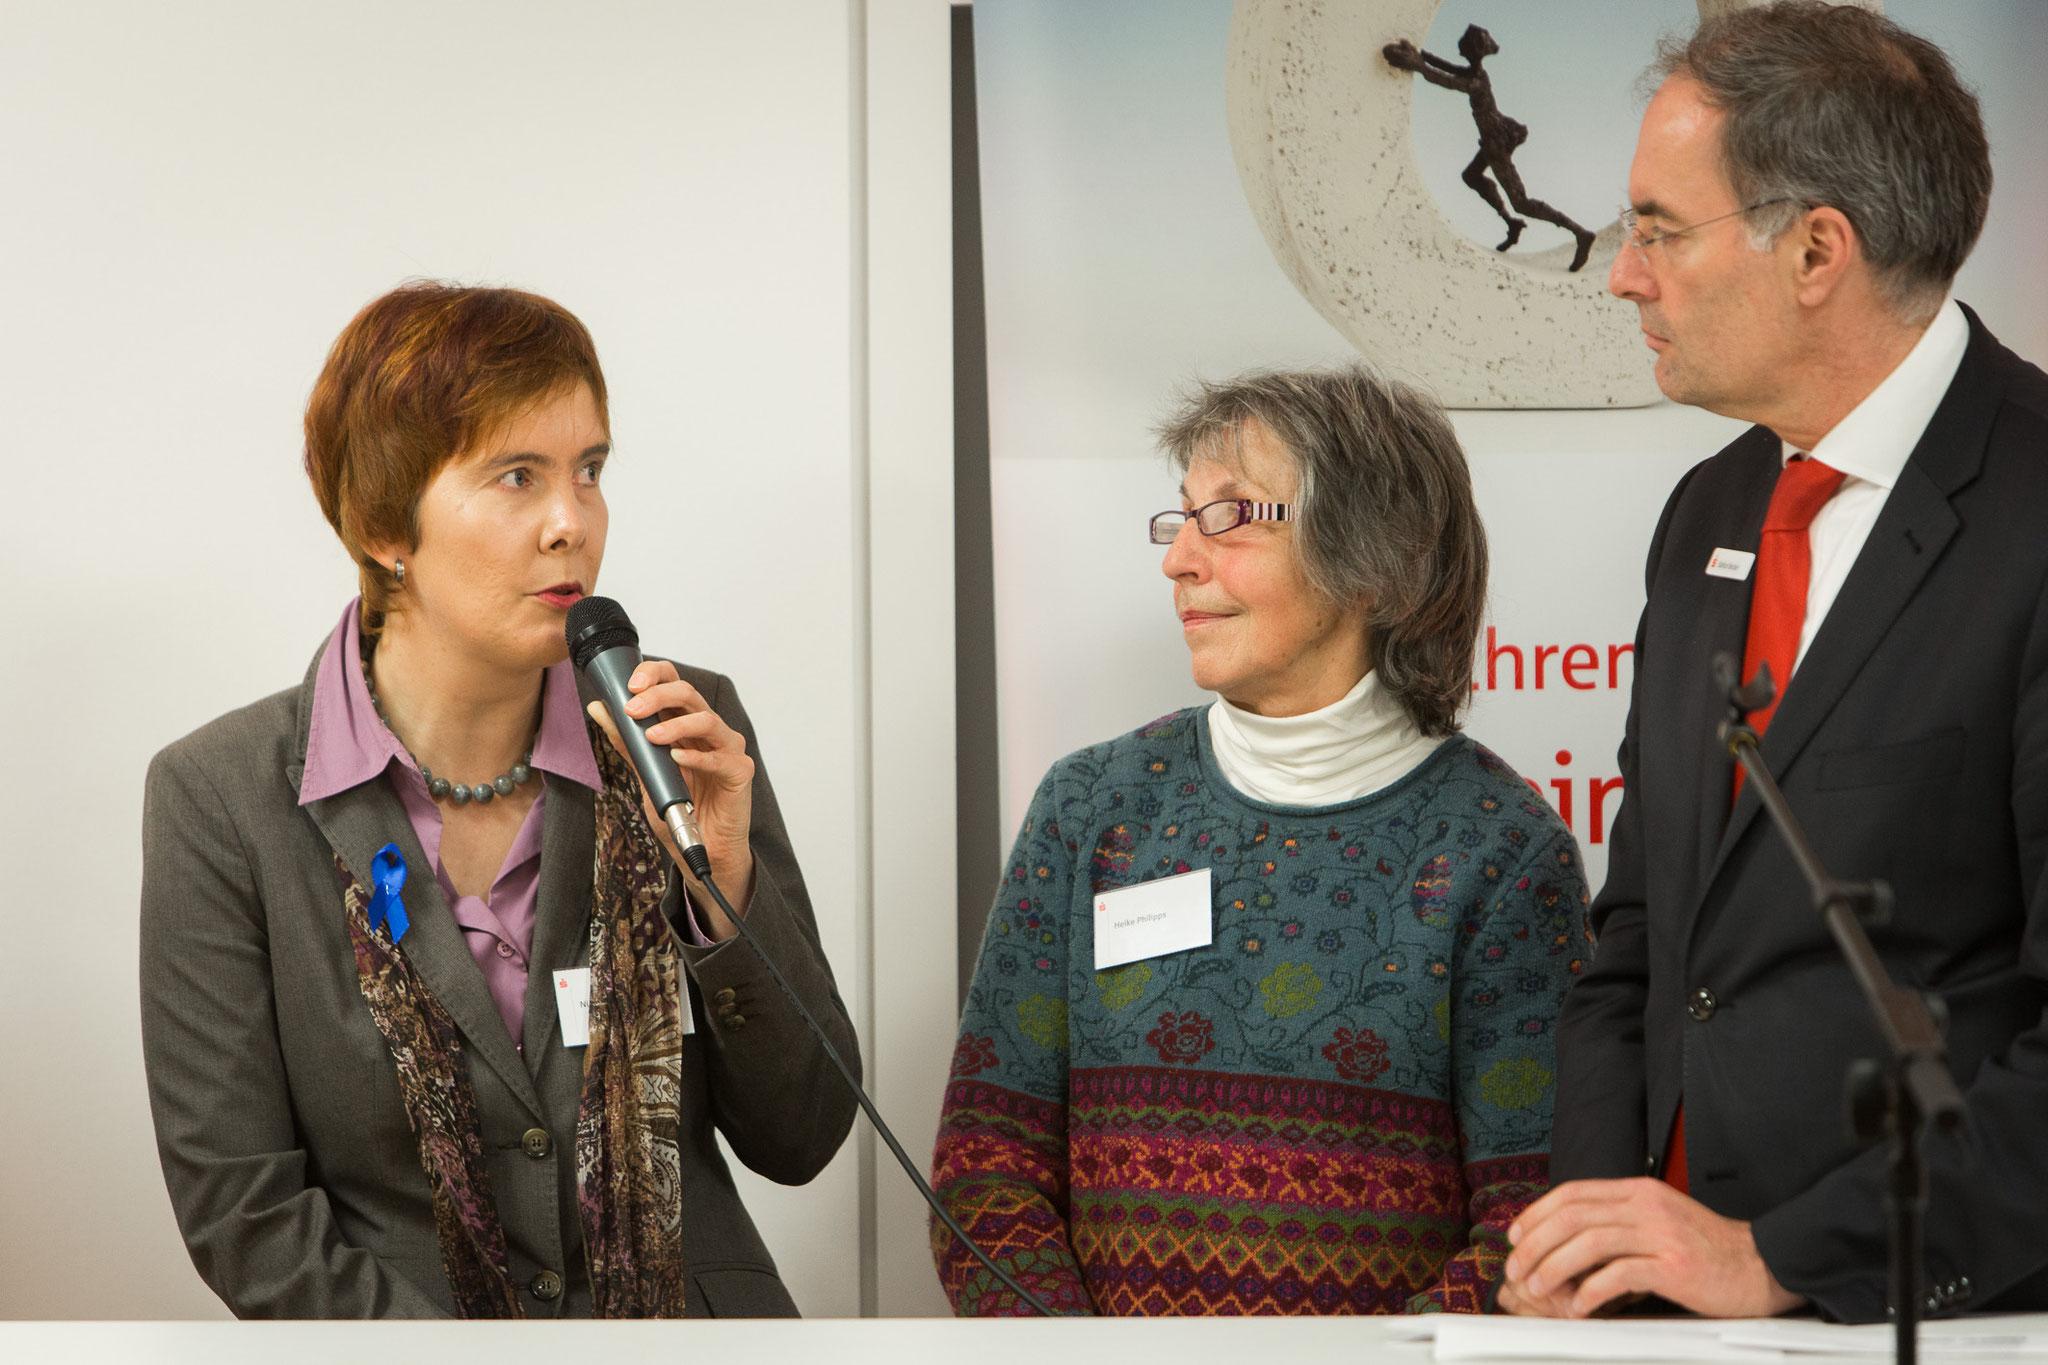 v.l. Nicole Krüger, Heike Philipps (1.Preis der Igel-Schutz-Initiative),Pressesprecher Spk. Hannover Stefan Becker